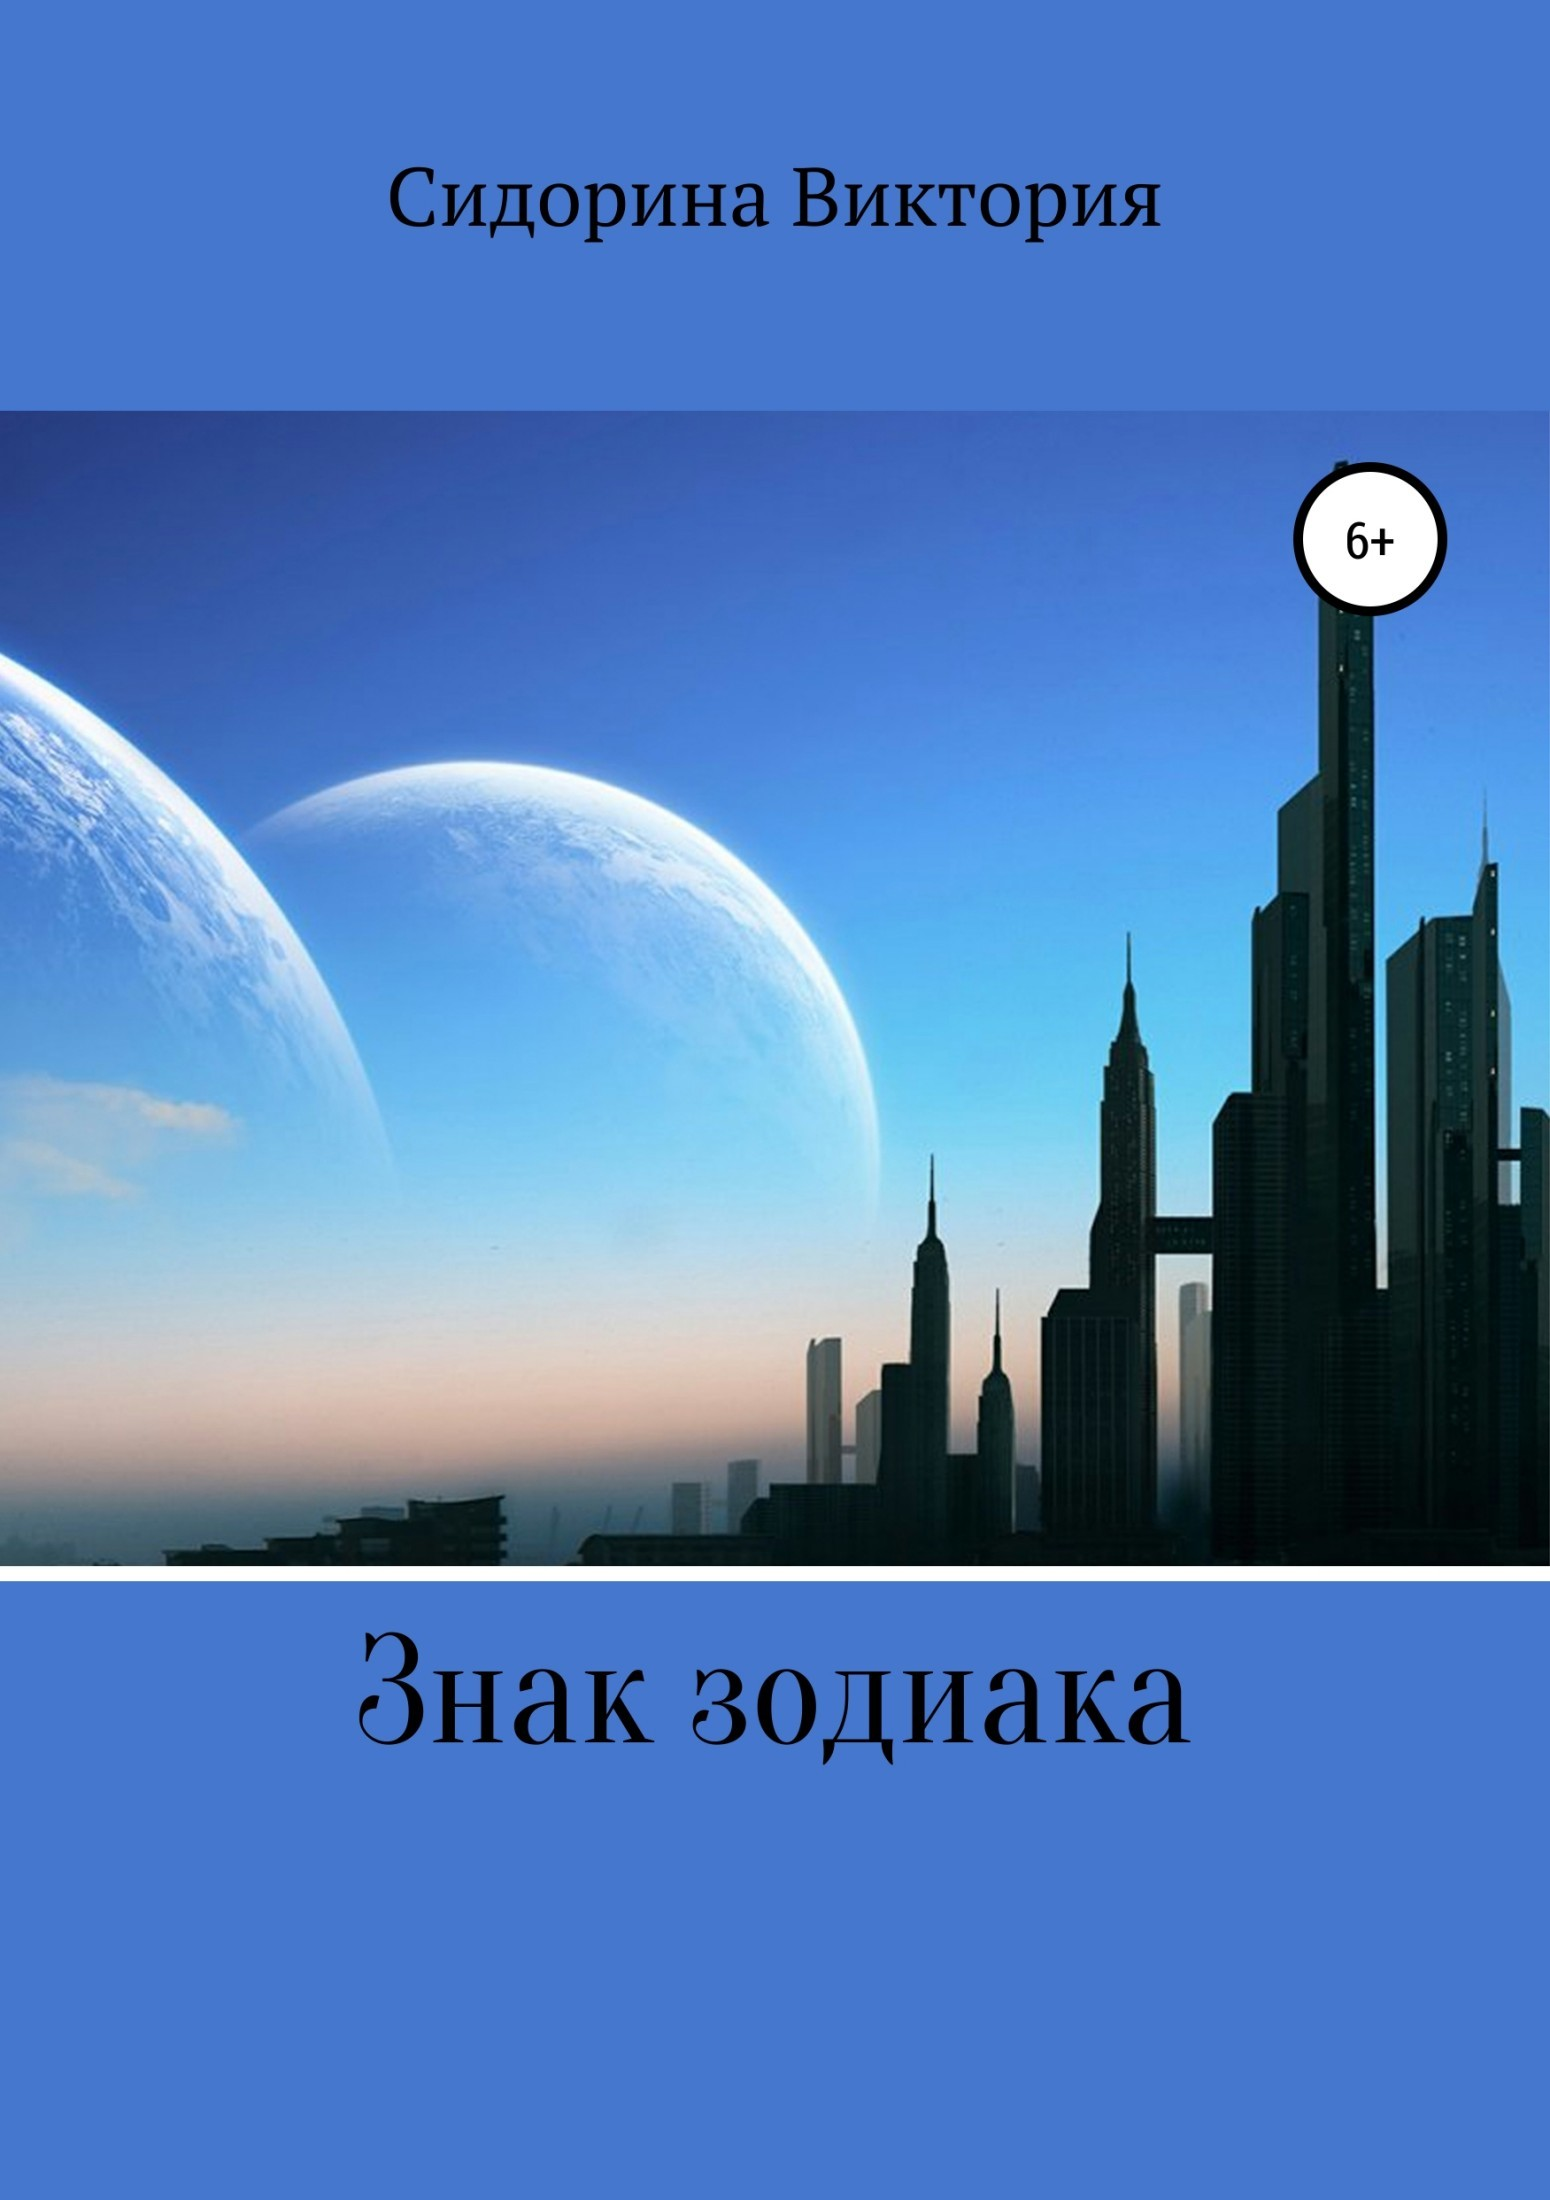 Виктория Сидорина - Знак зодиака